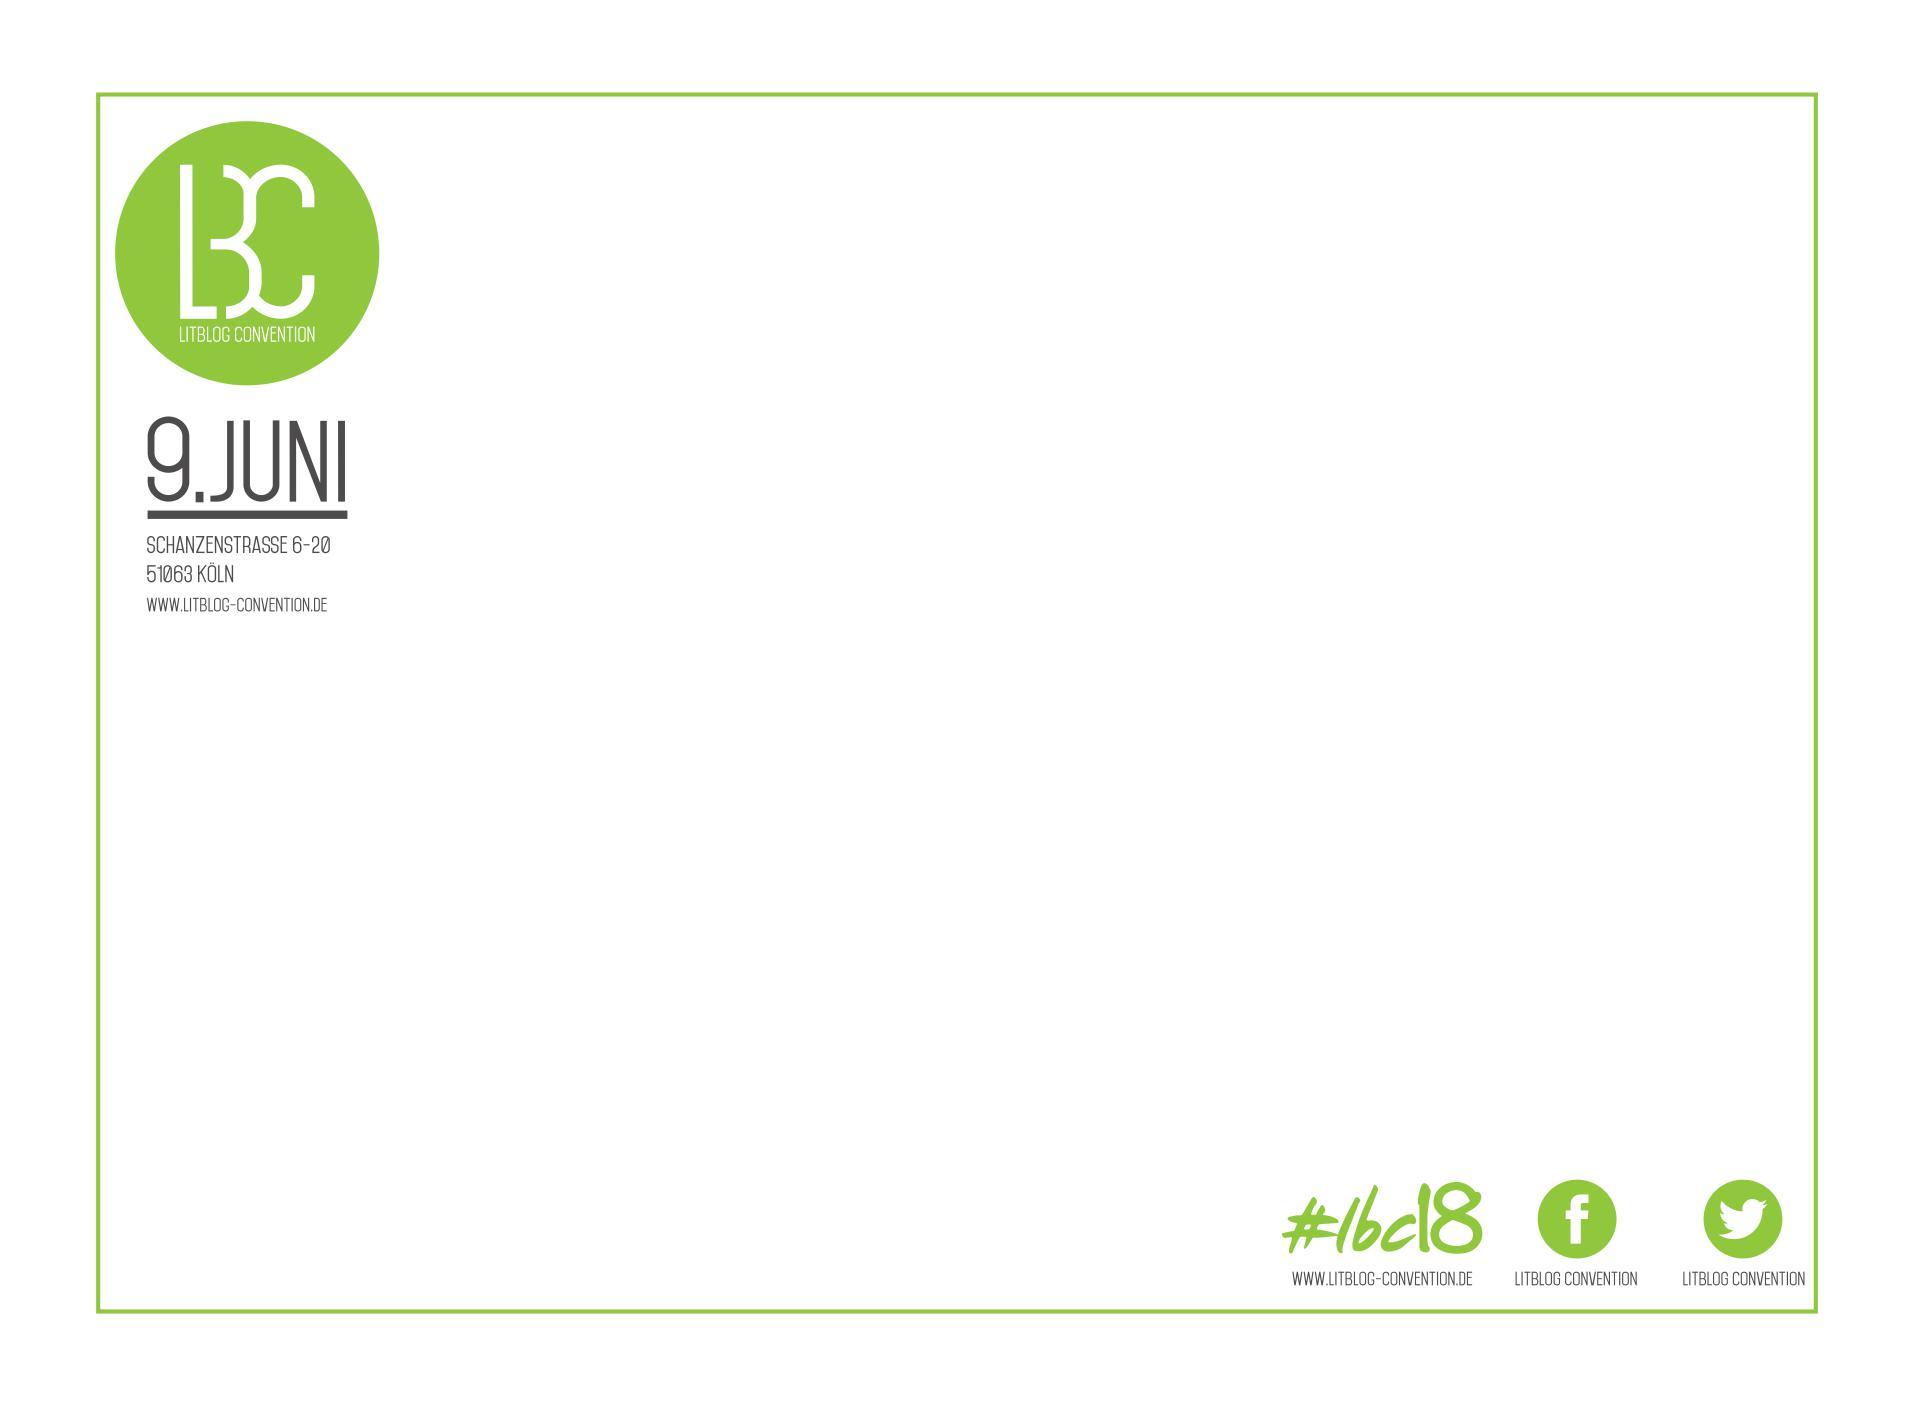 LBC18 Postkarten-Rückseite